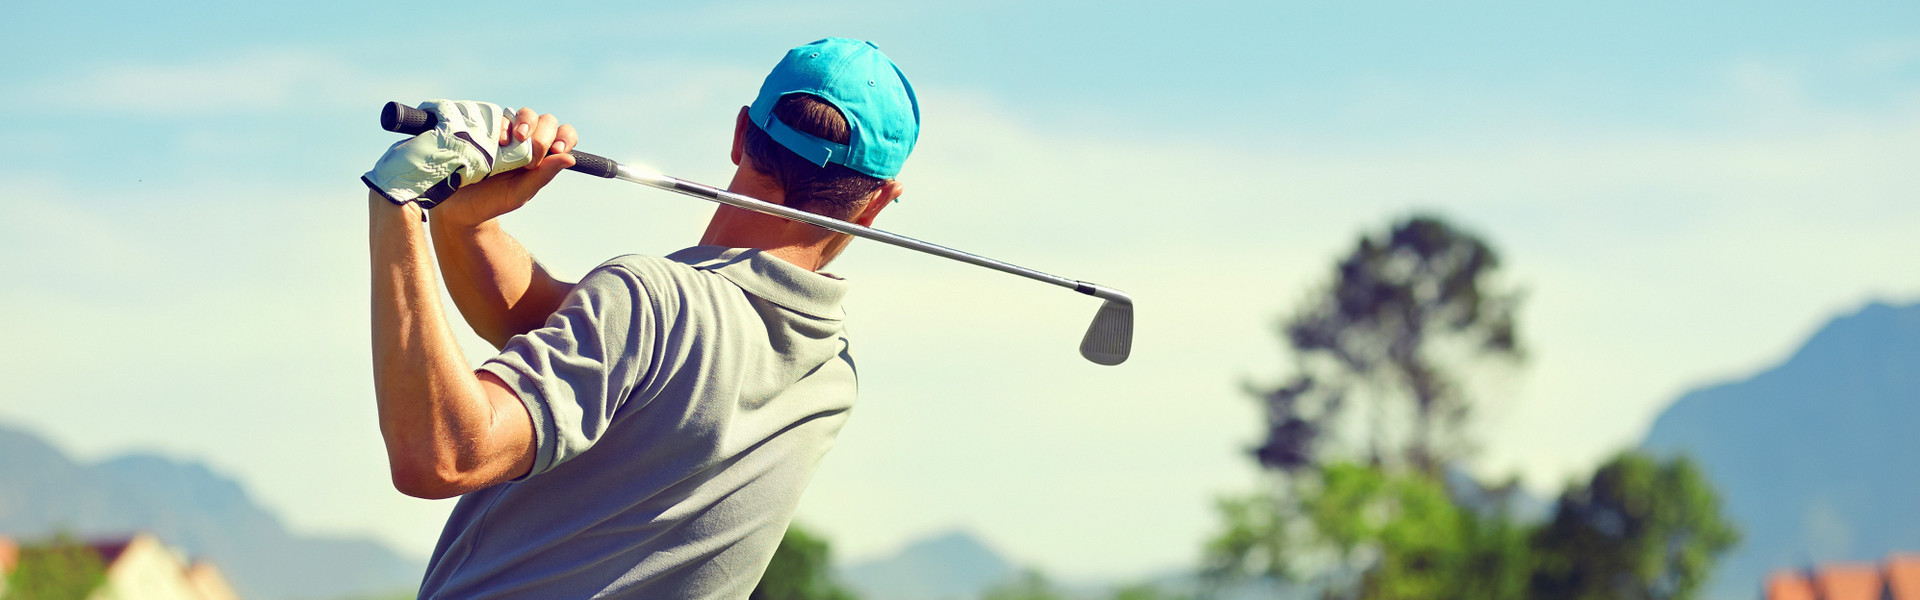 Golf Resort Deals In Park City Utah - golf